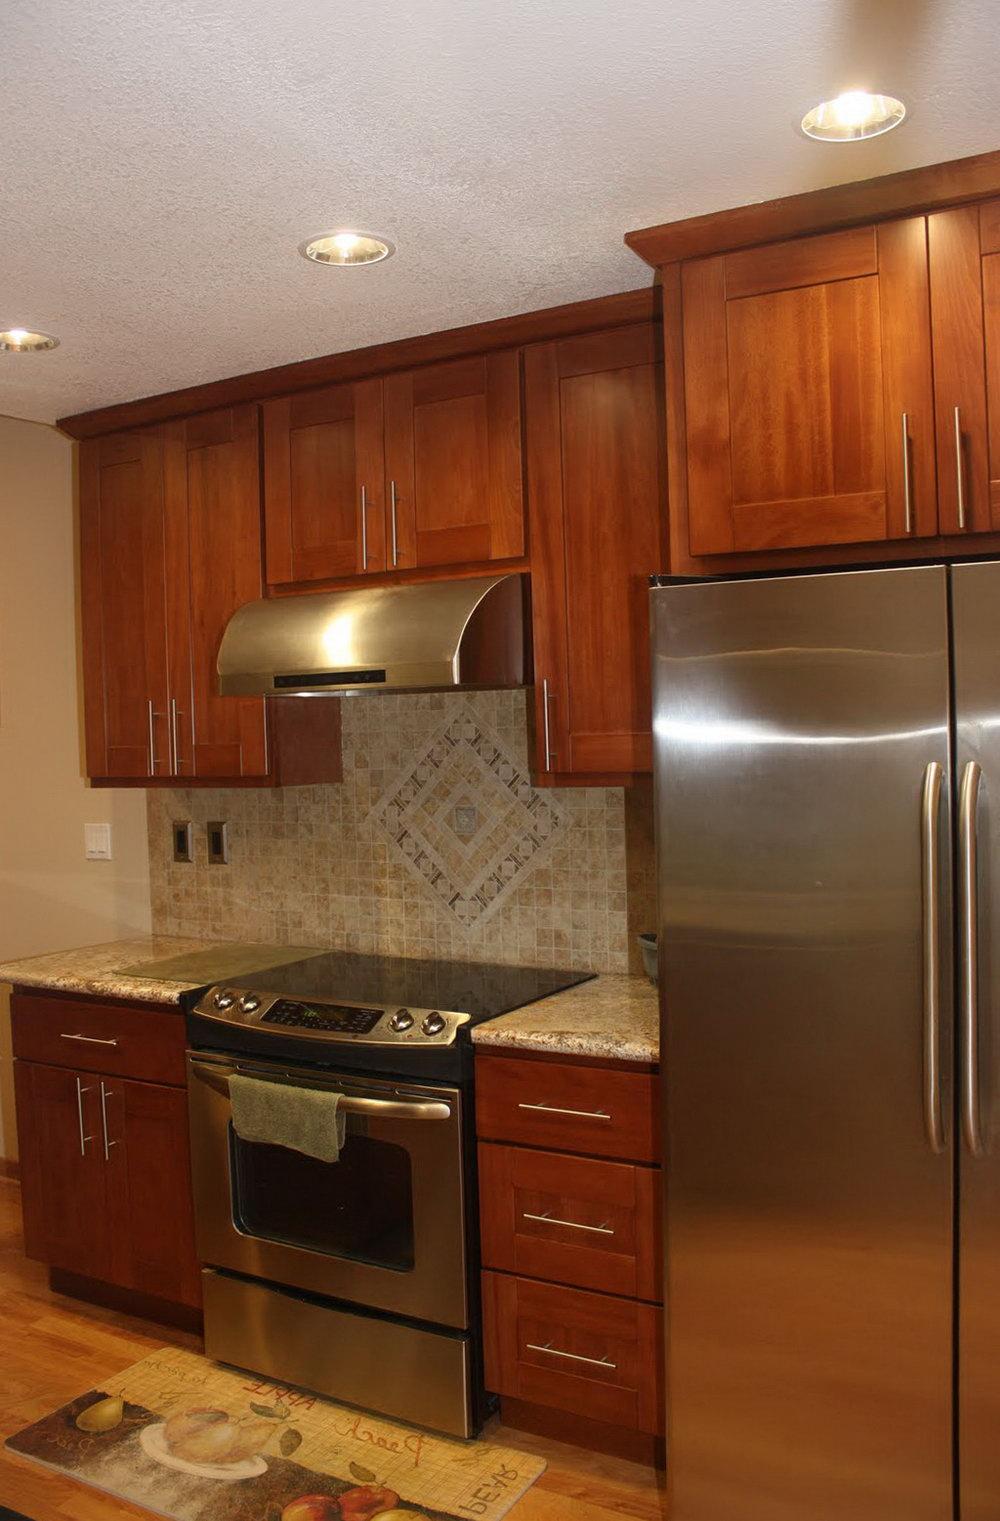 Photos Of Modern Kitchen Cabinets